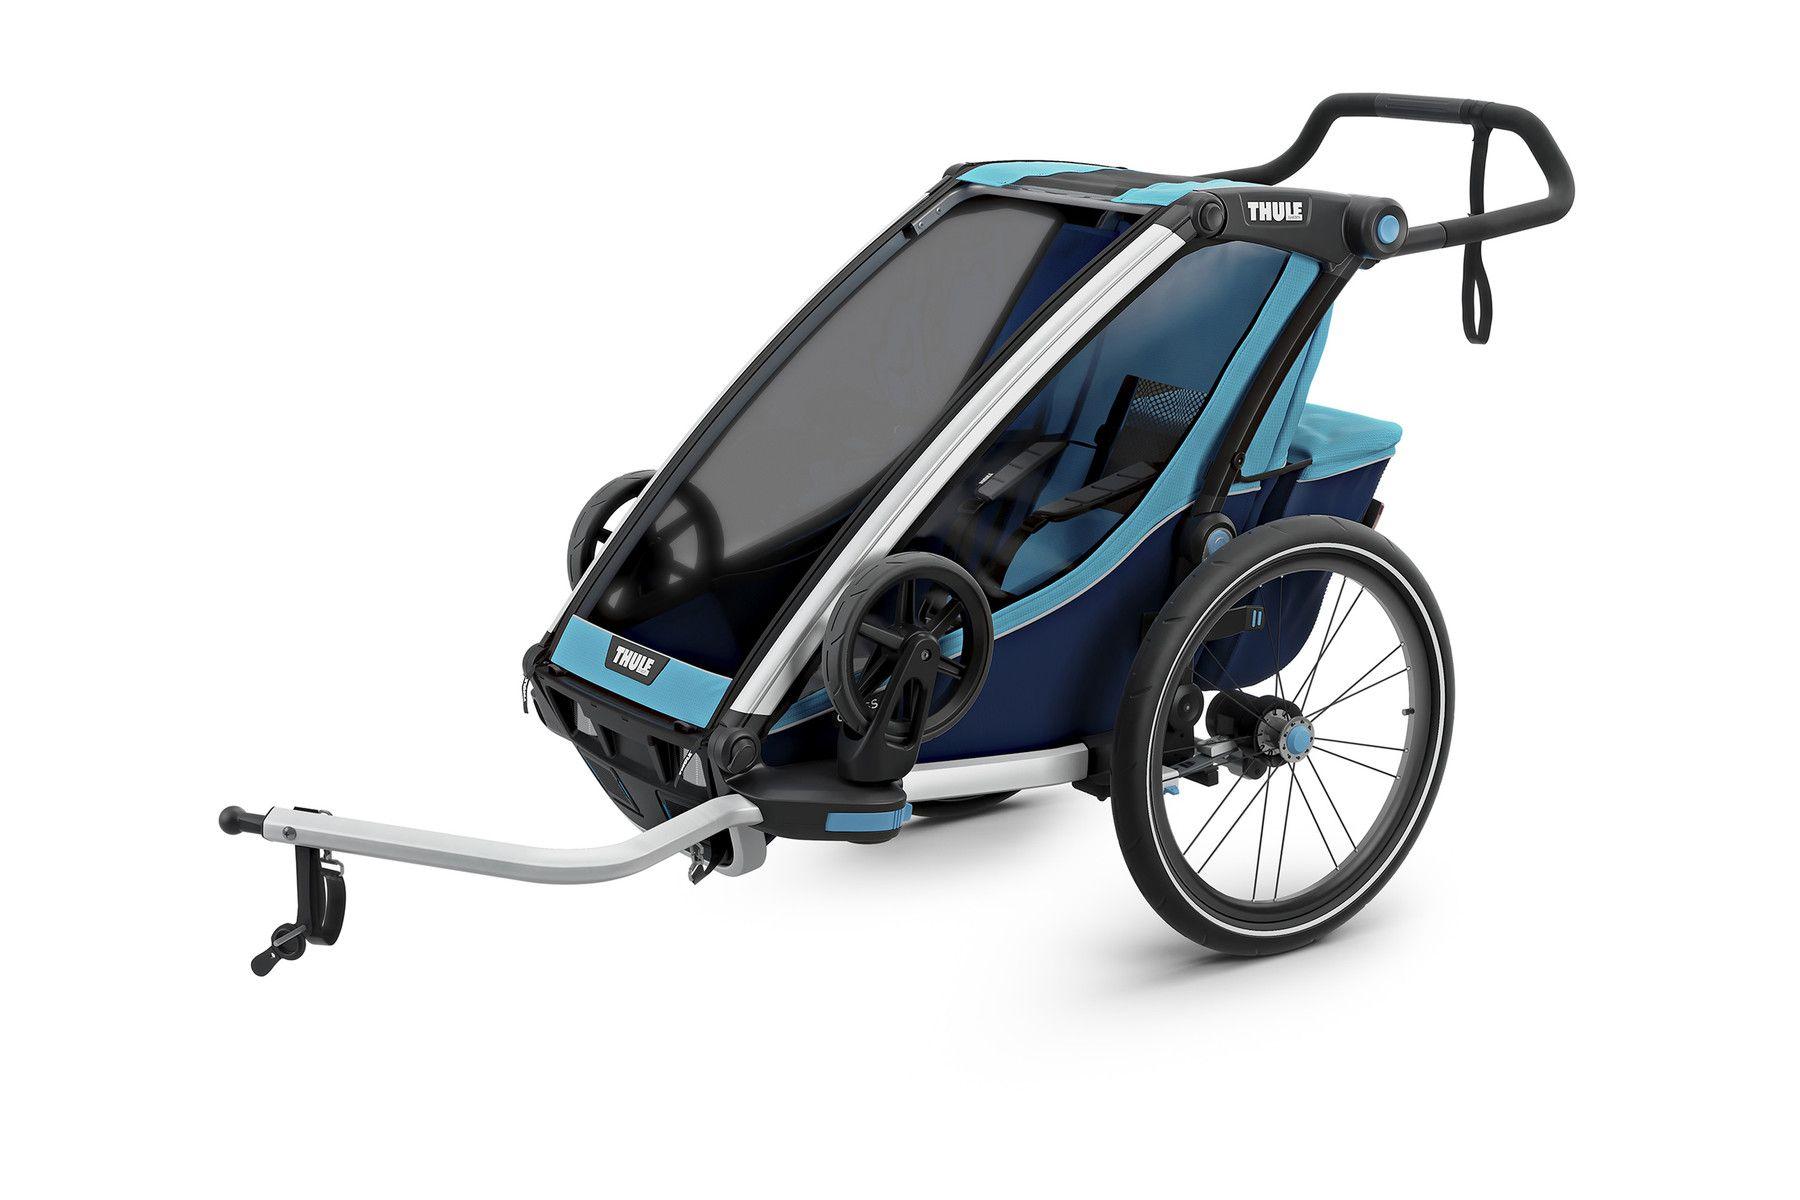 Chariot Cross 2 Bike, Child bike seat, Double strollers